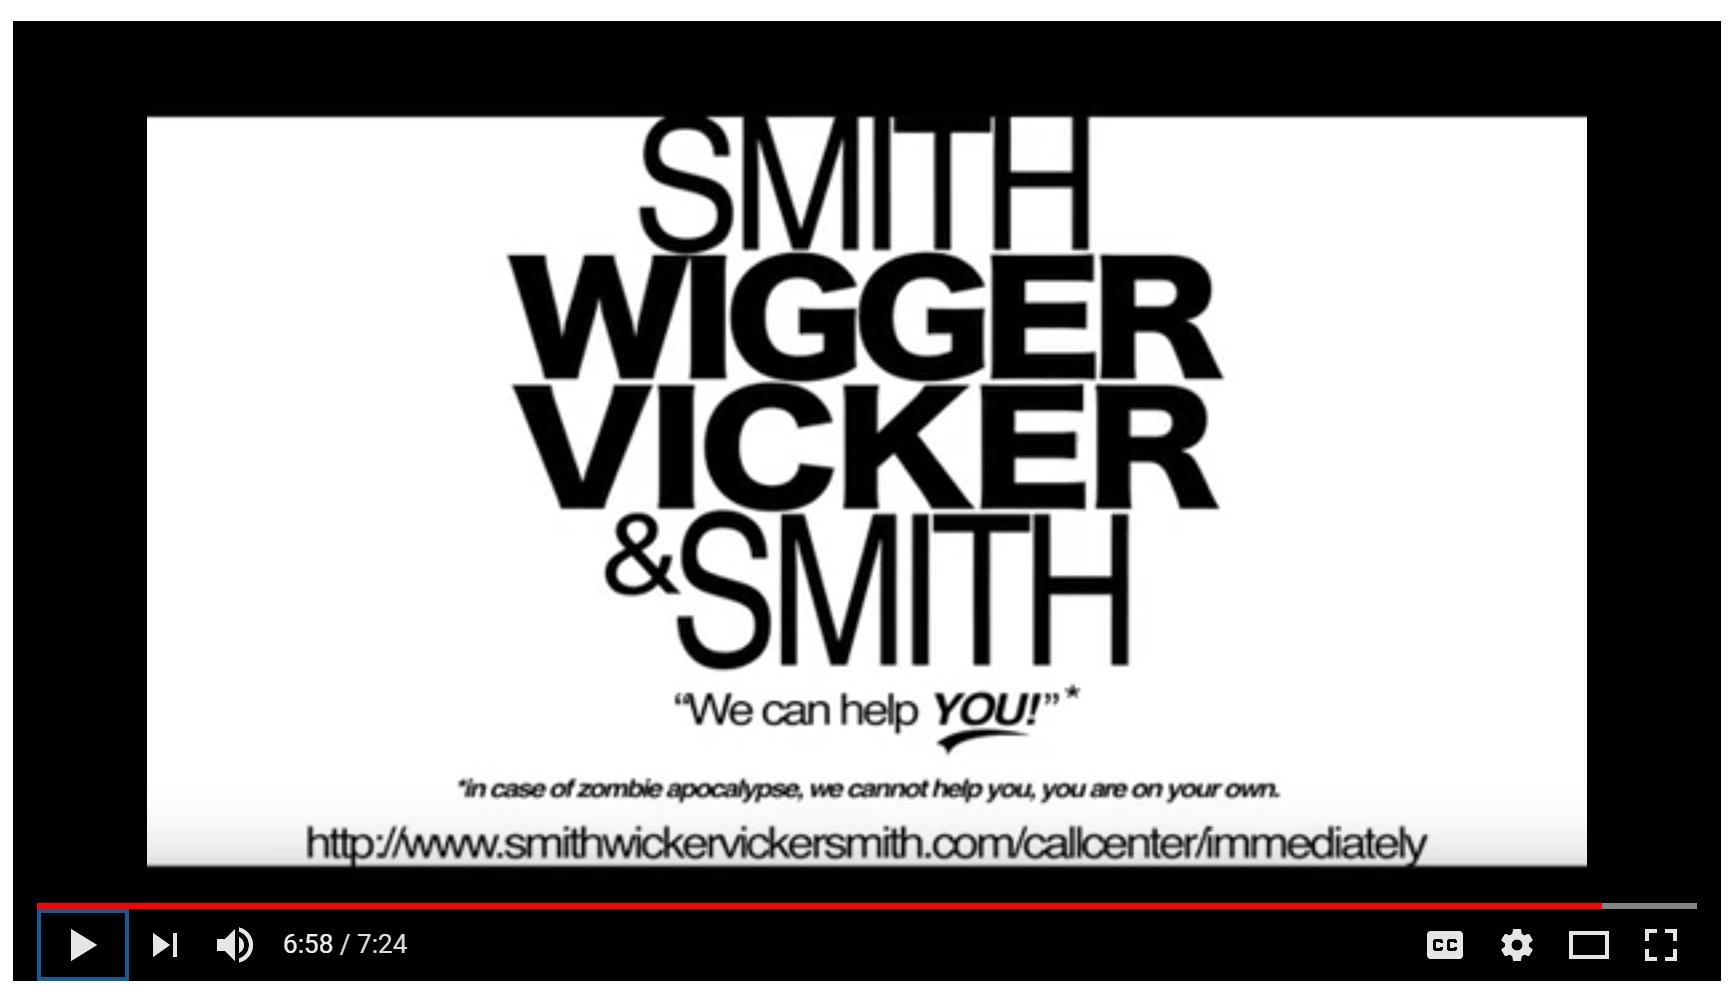 """Smith, Wigger, Vicker & Smith"""